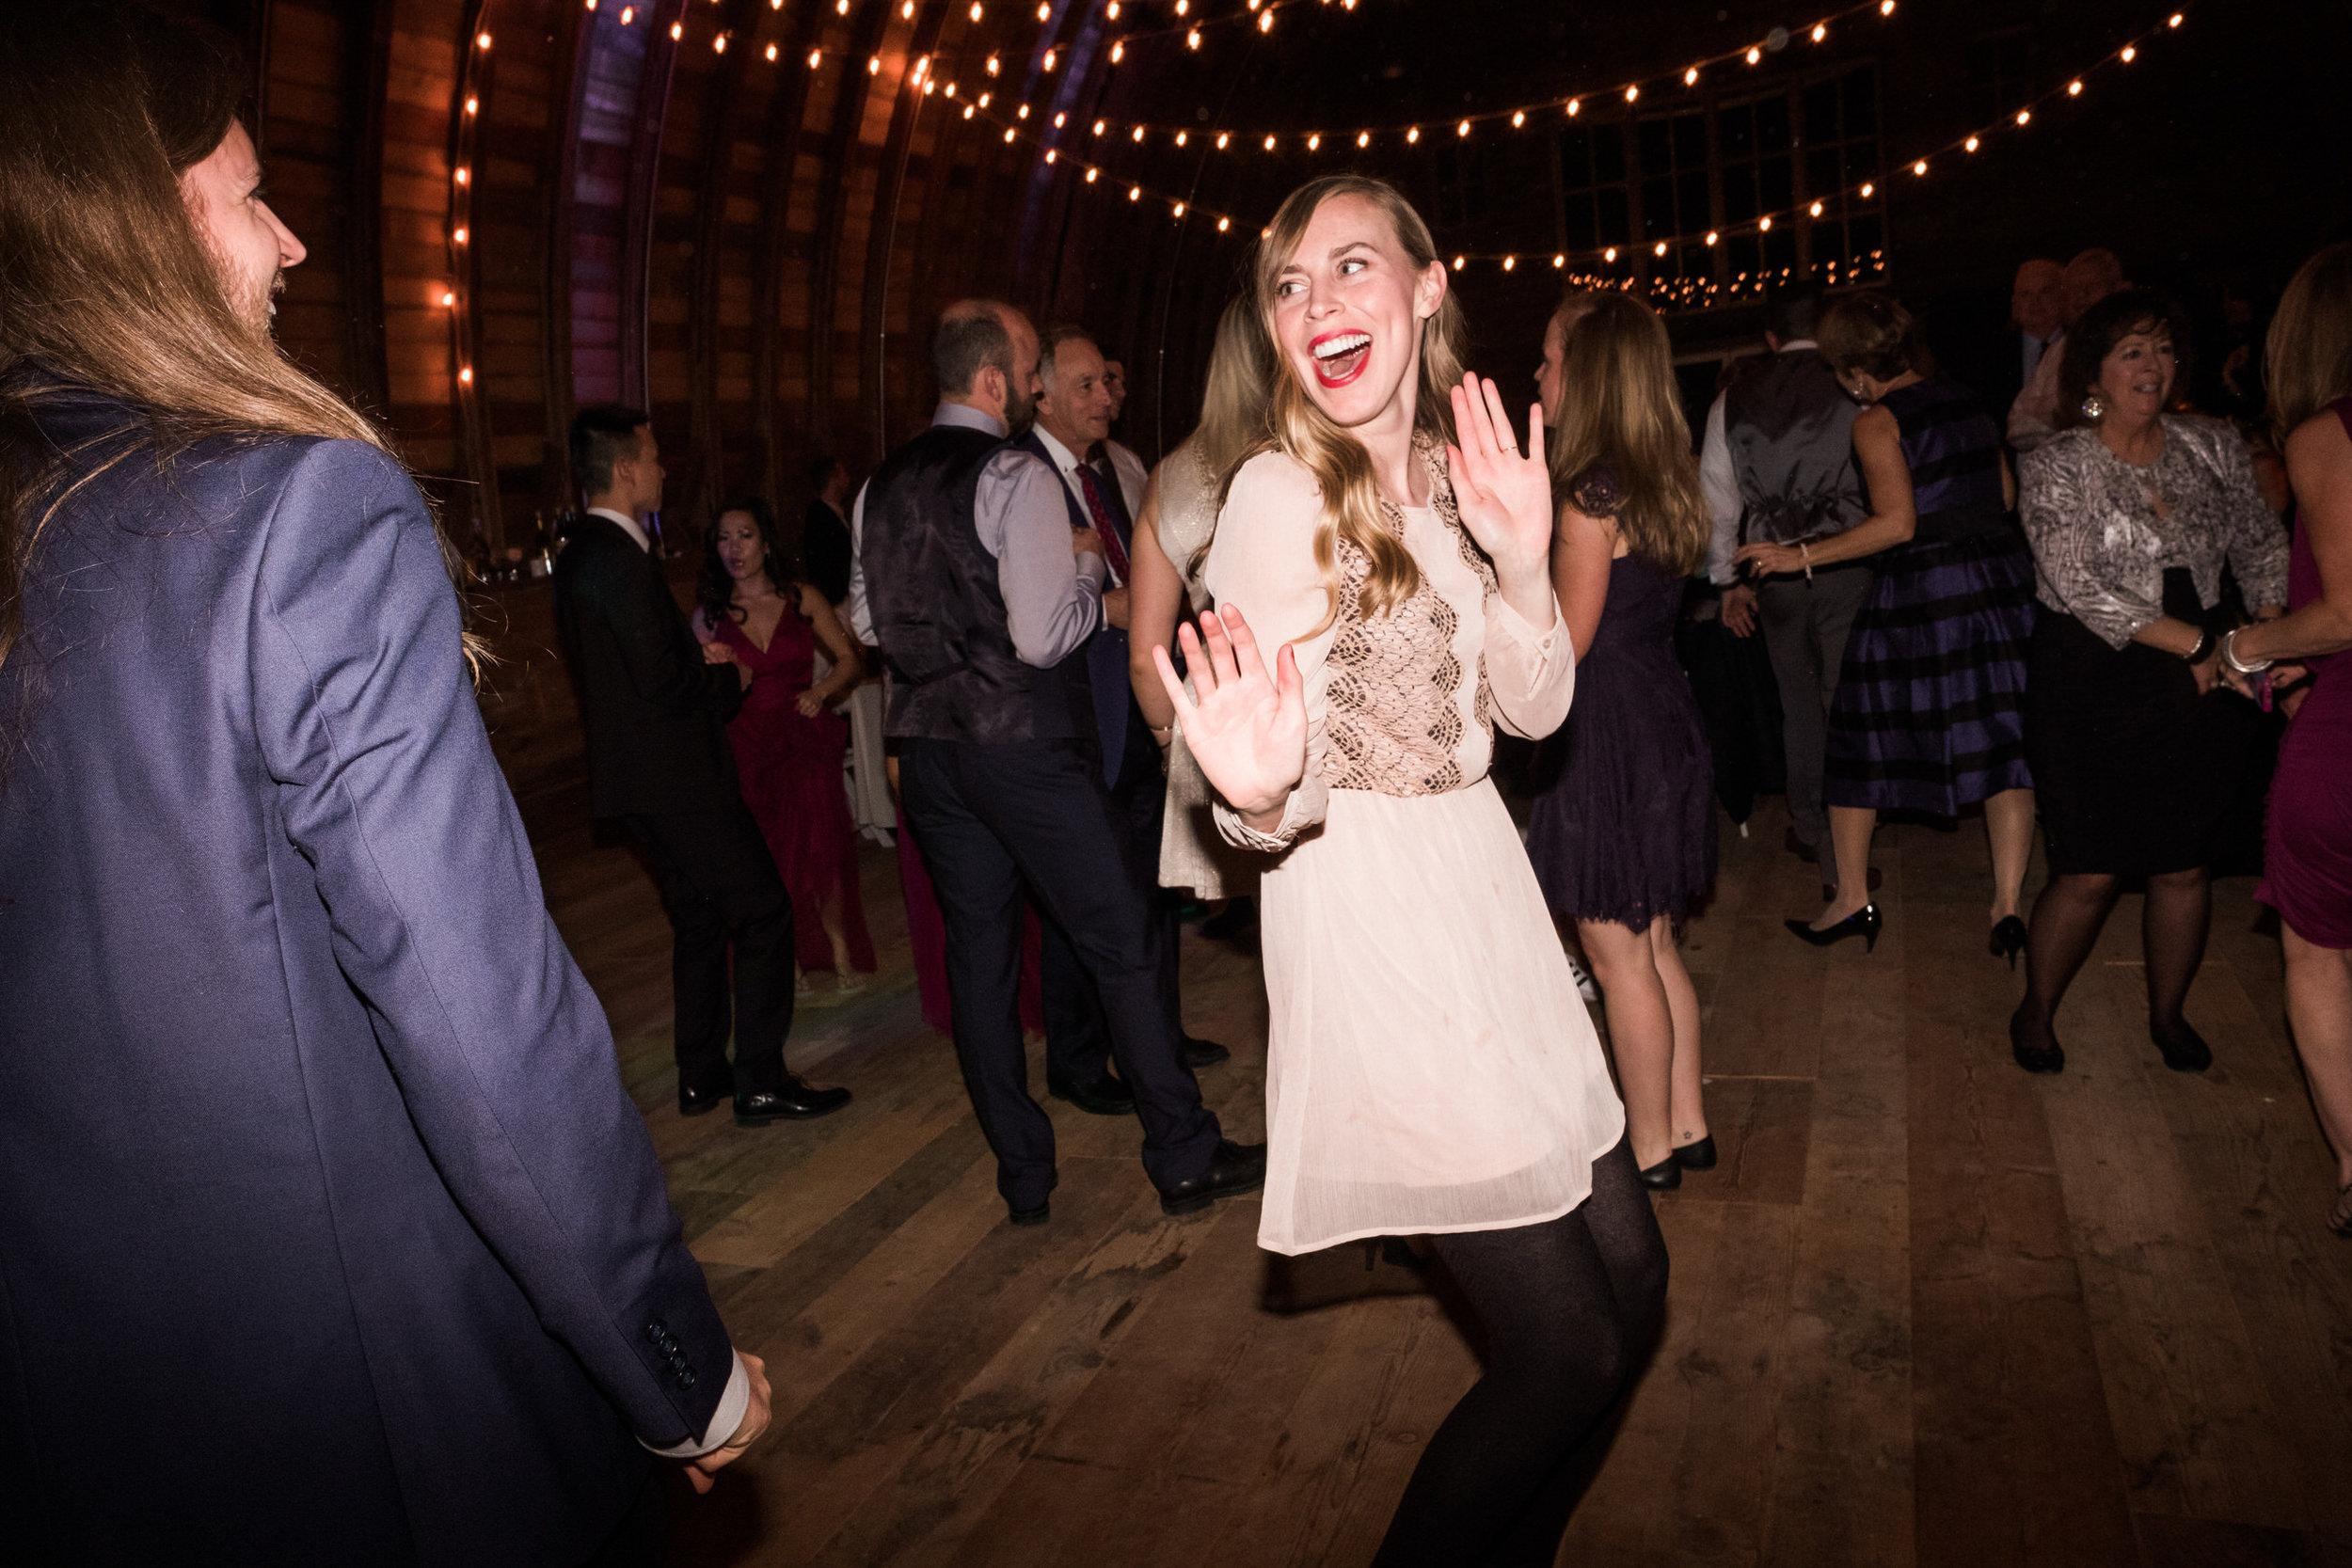 minnesota barn wedding dance